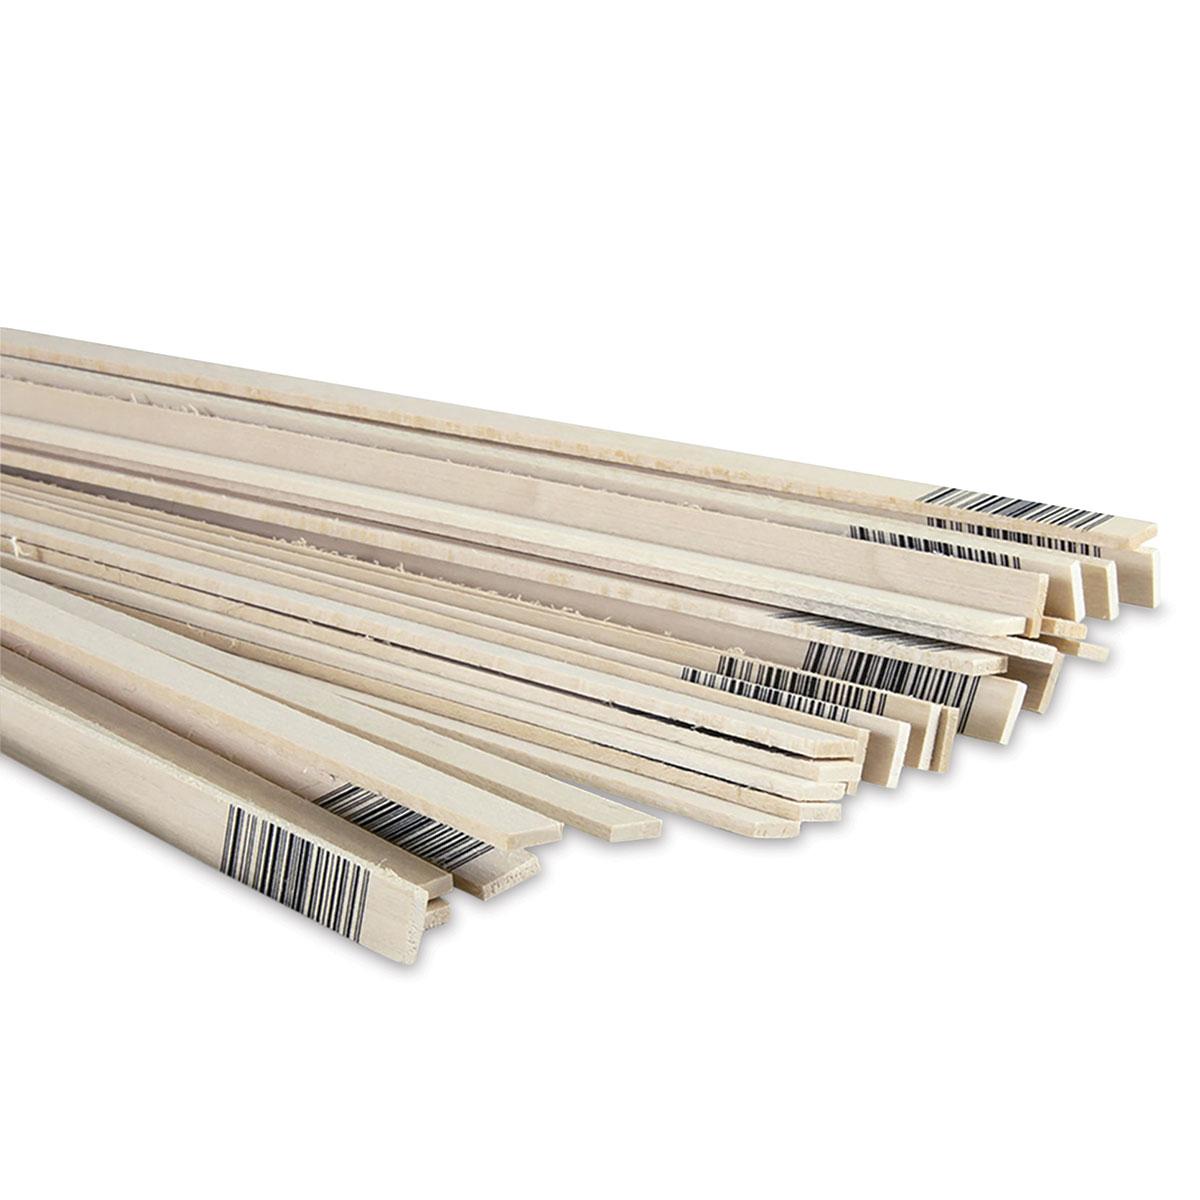 5 BWS3213 Bass Wood 3//32 x 3 x 24